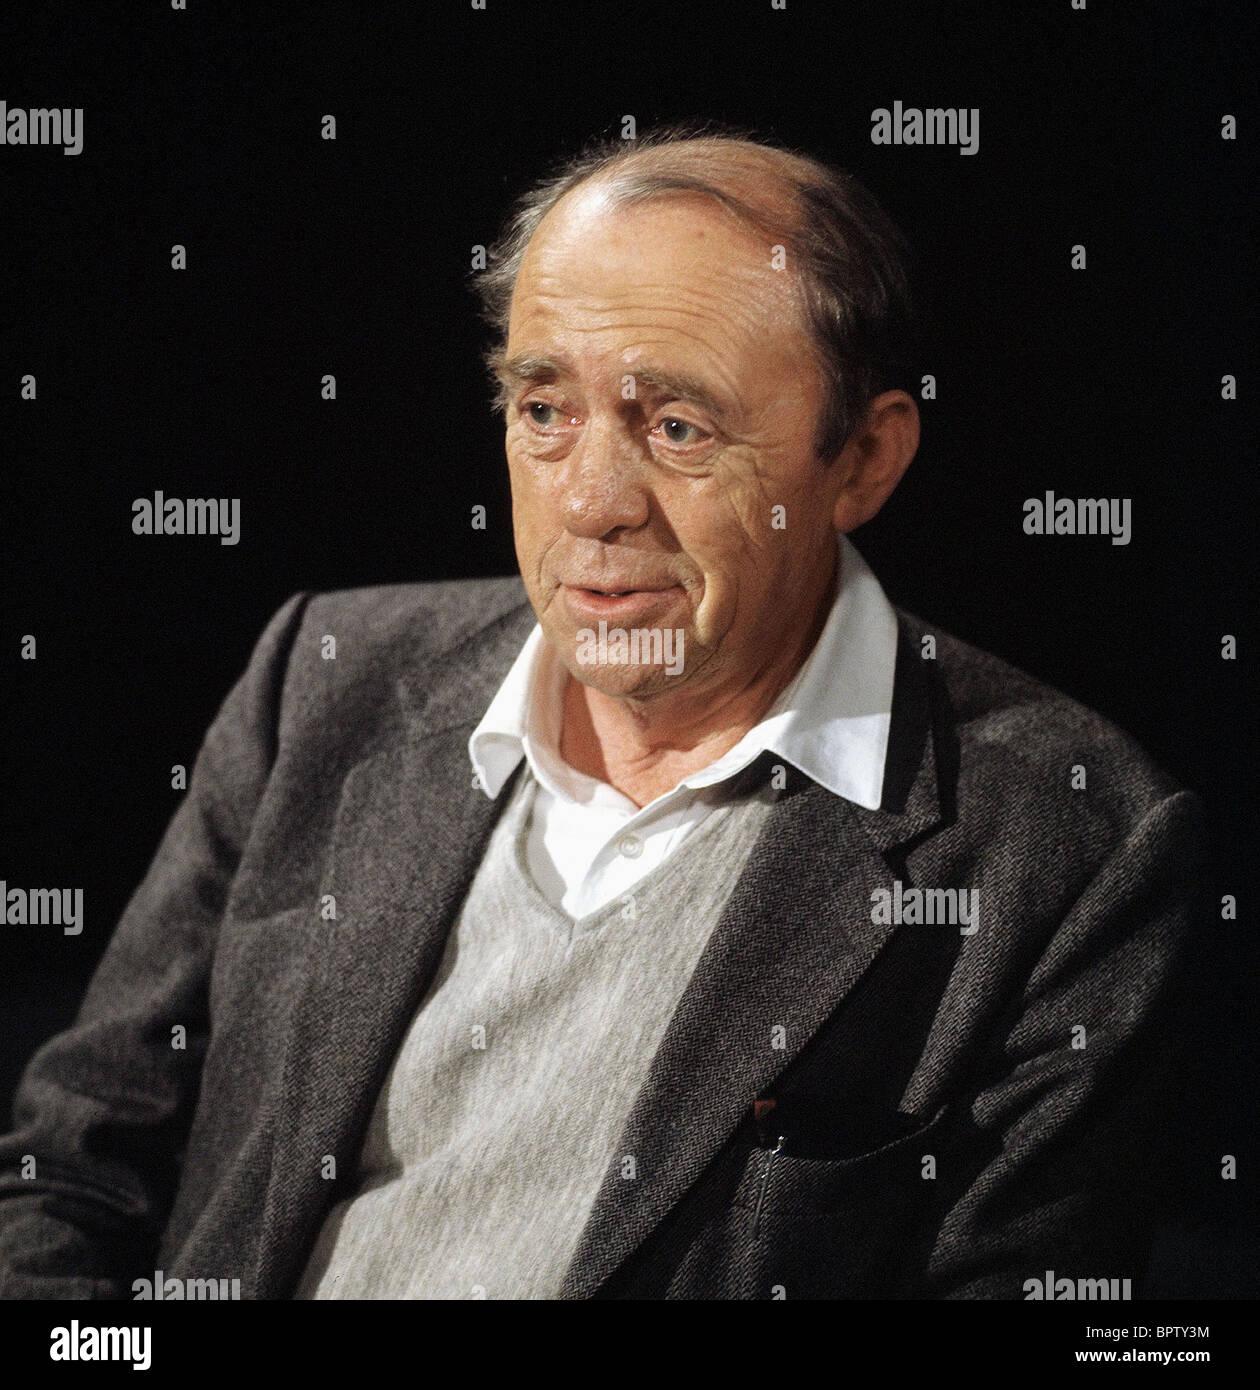 HEINRICH BOLL WRITER (1985) - Stock Image